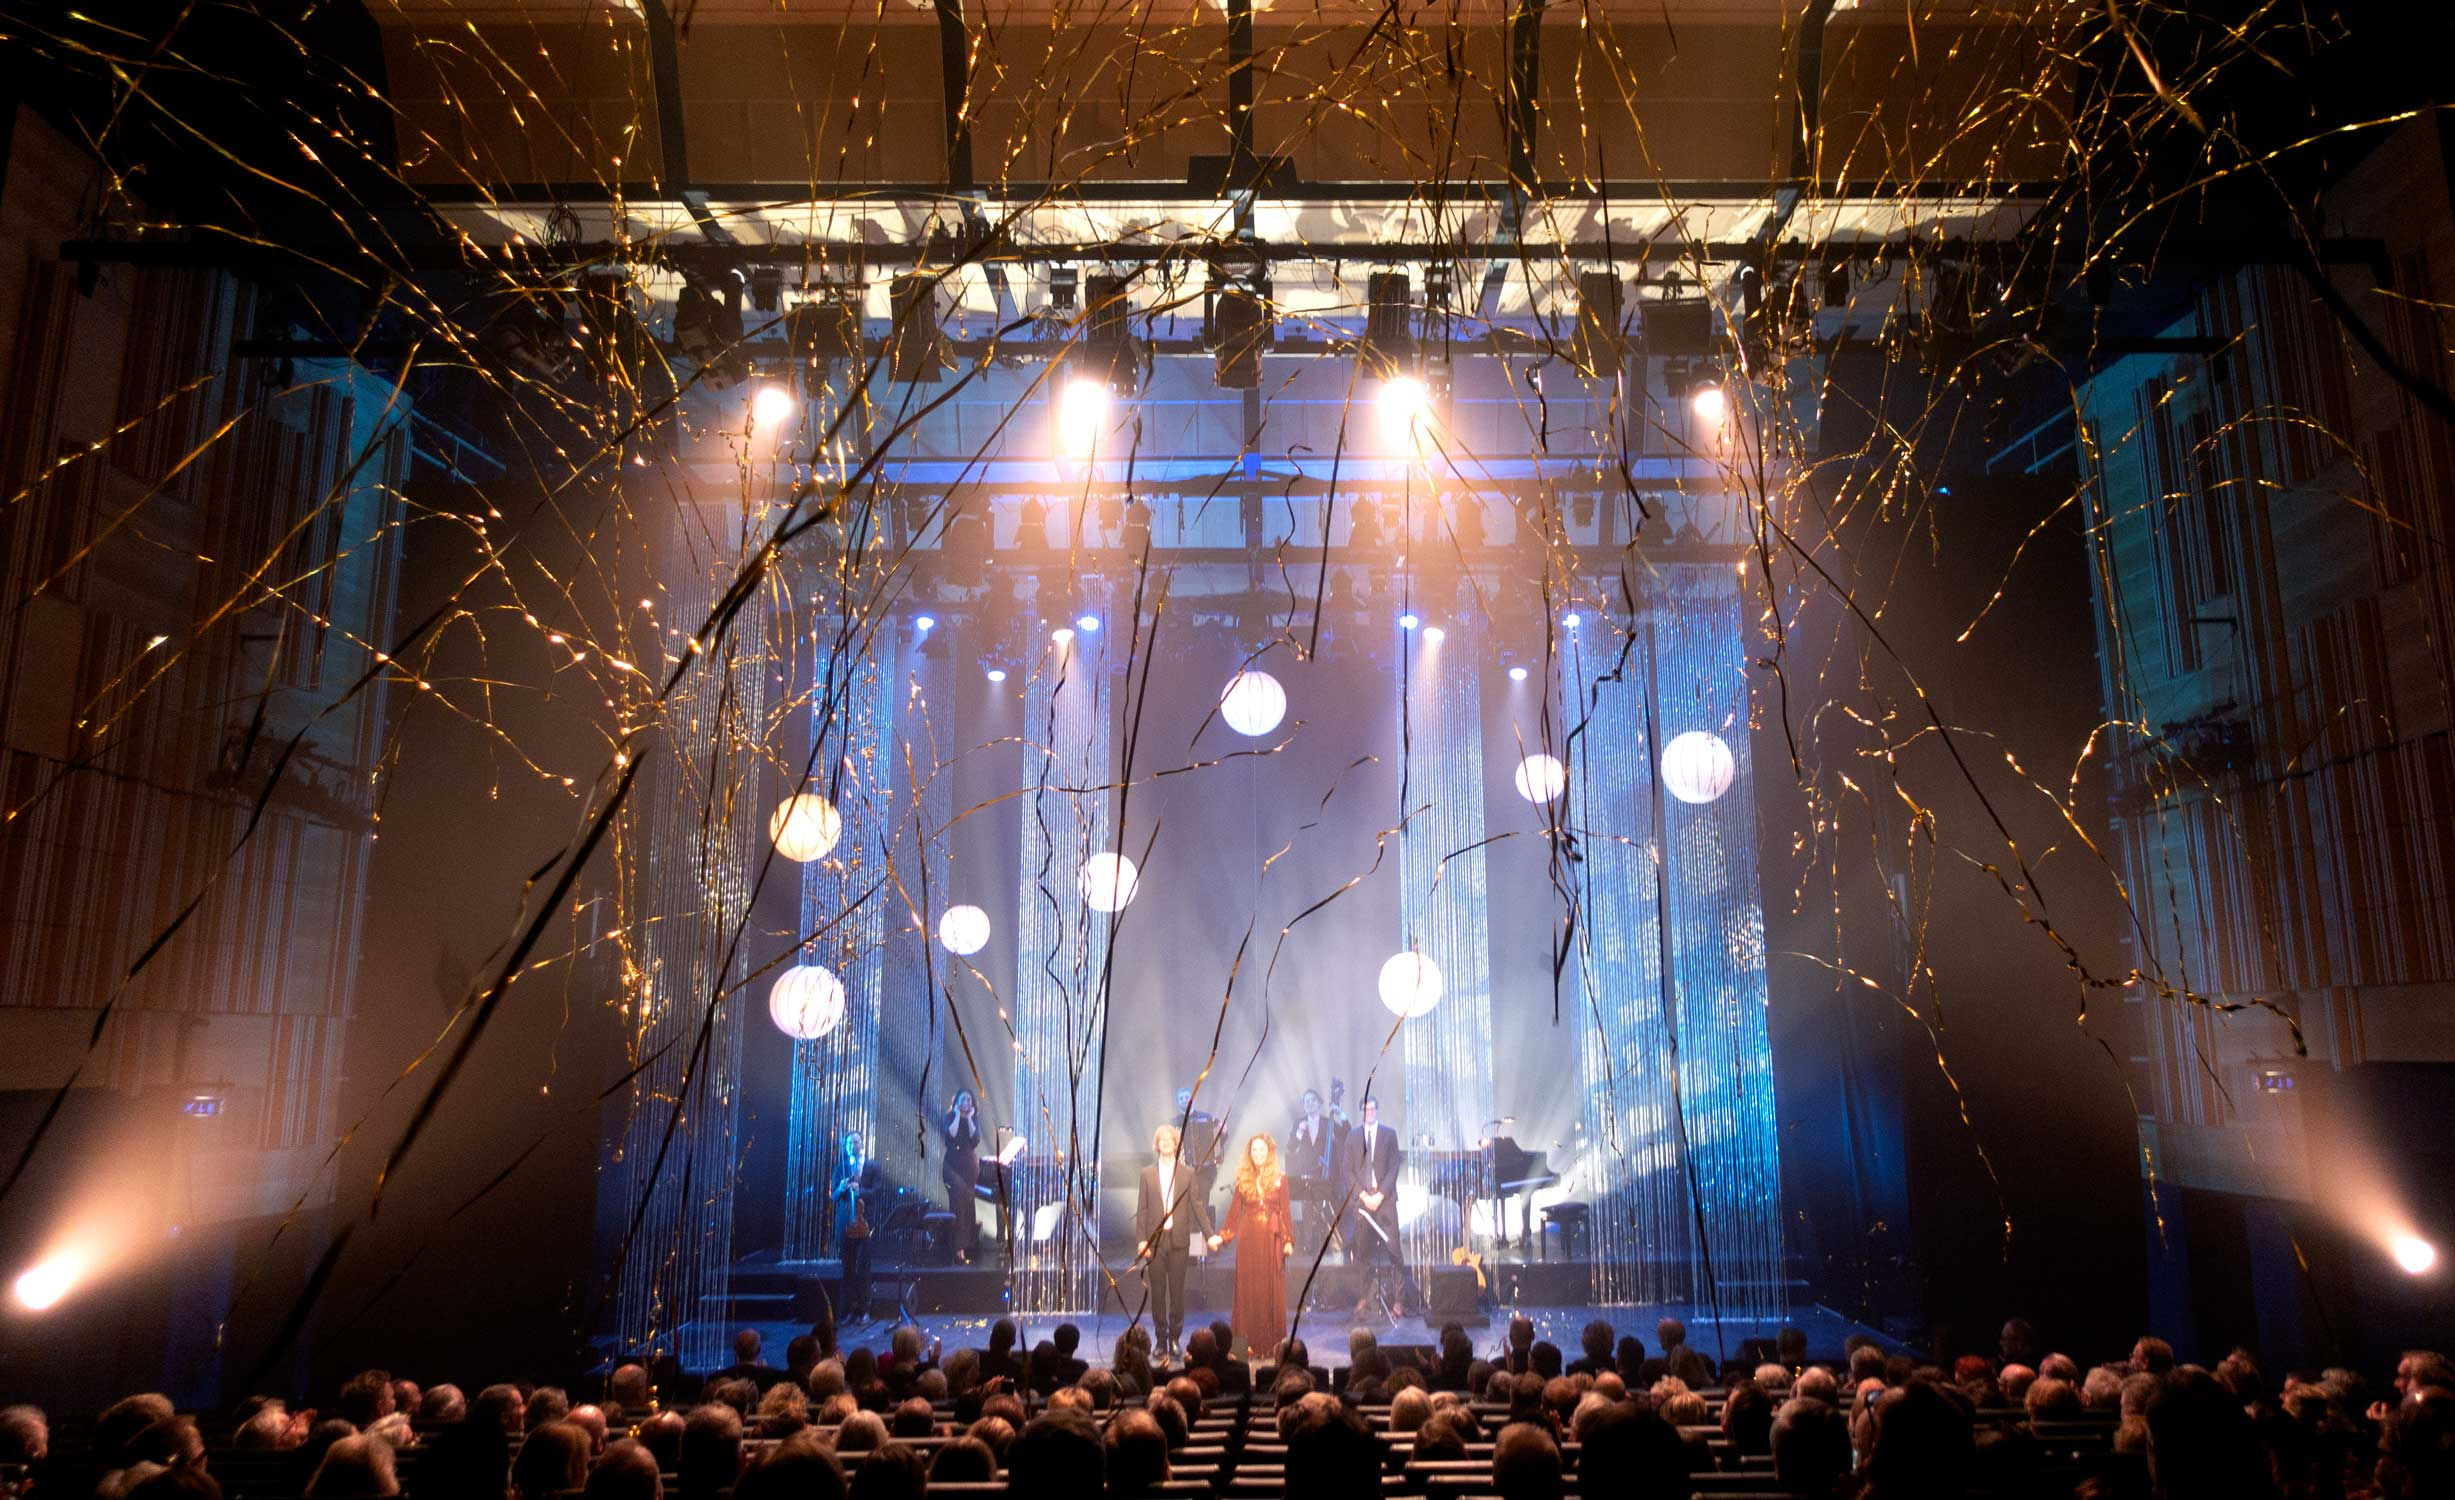 Nytårskoncert-Den-Sorte-Diamant-20-01-Clement-Irbil